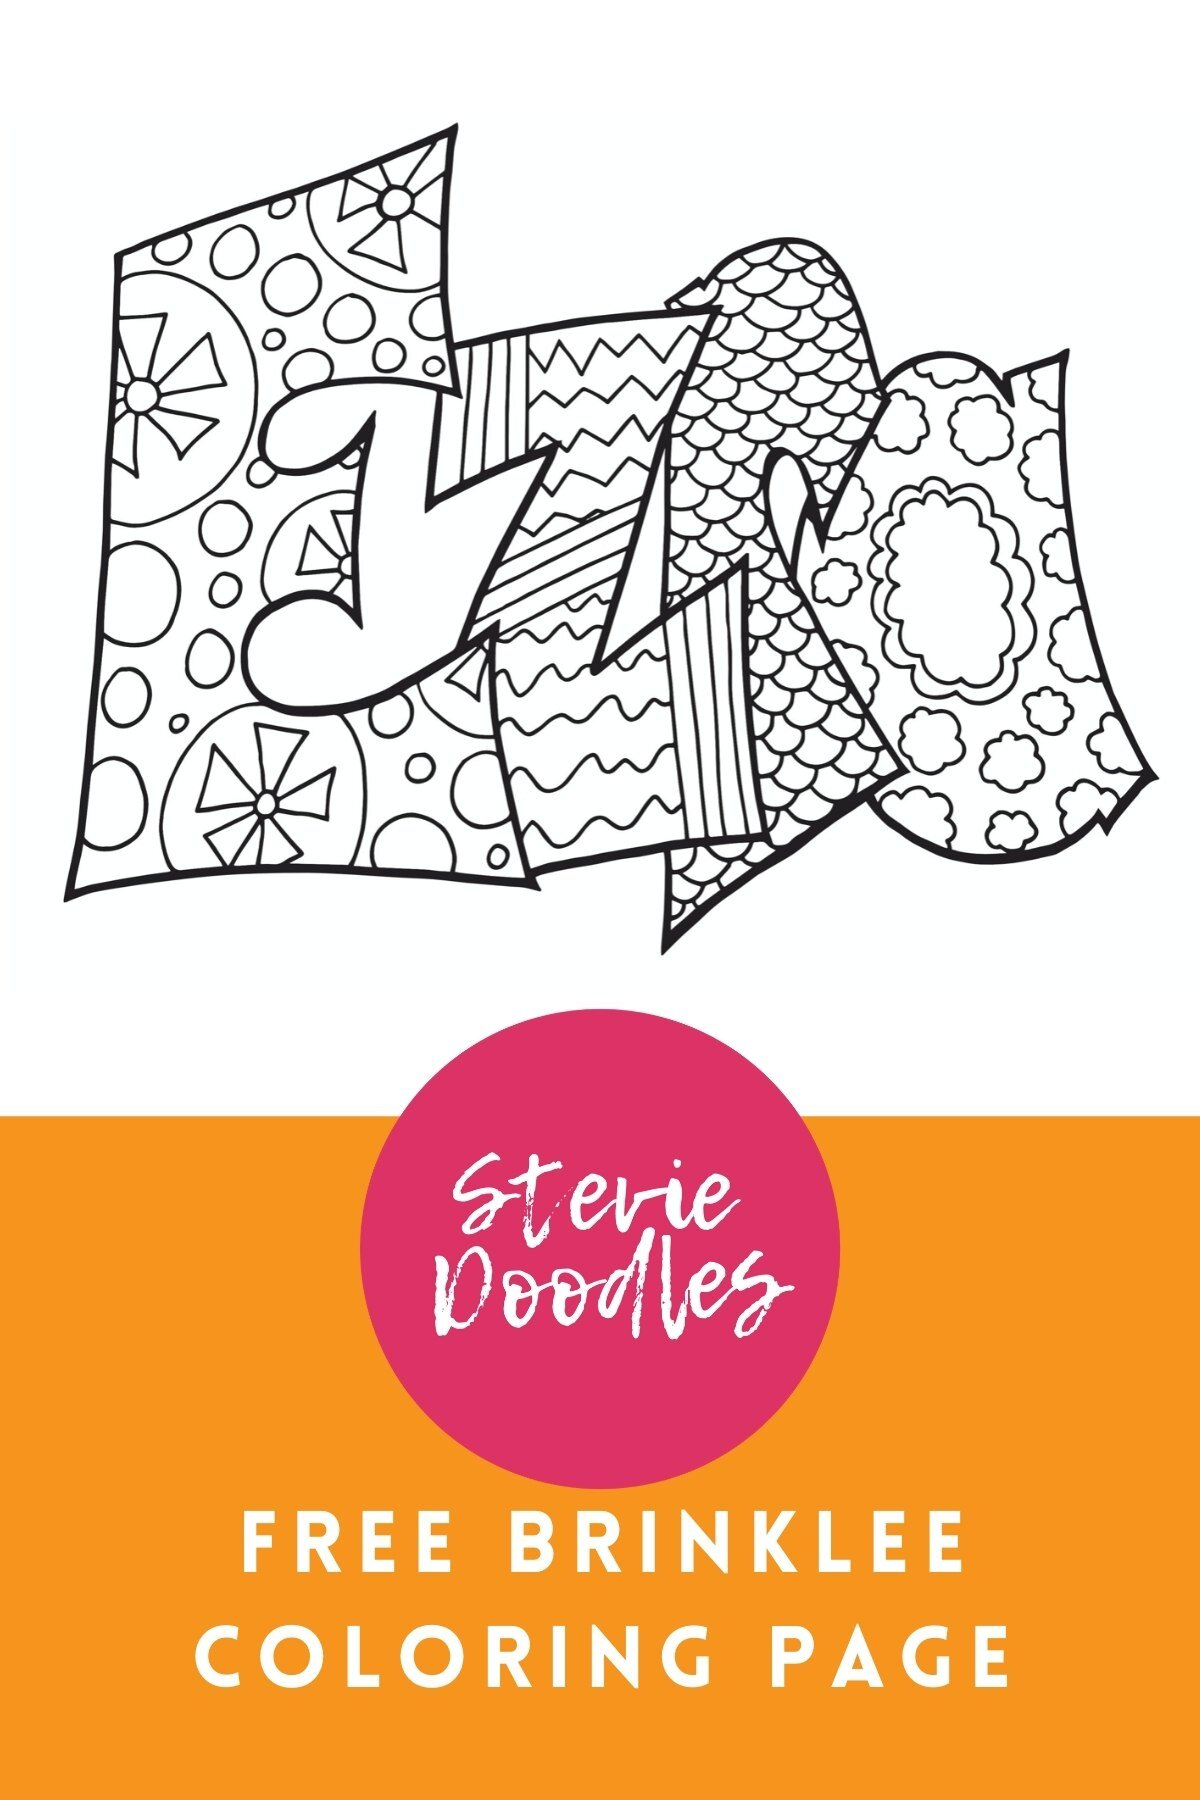 Ezra Free Name Coloring Page — Stevie Doodles Free Printable